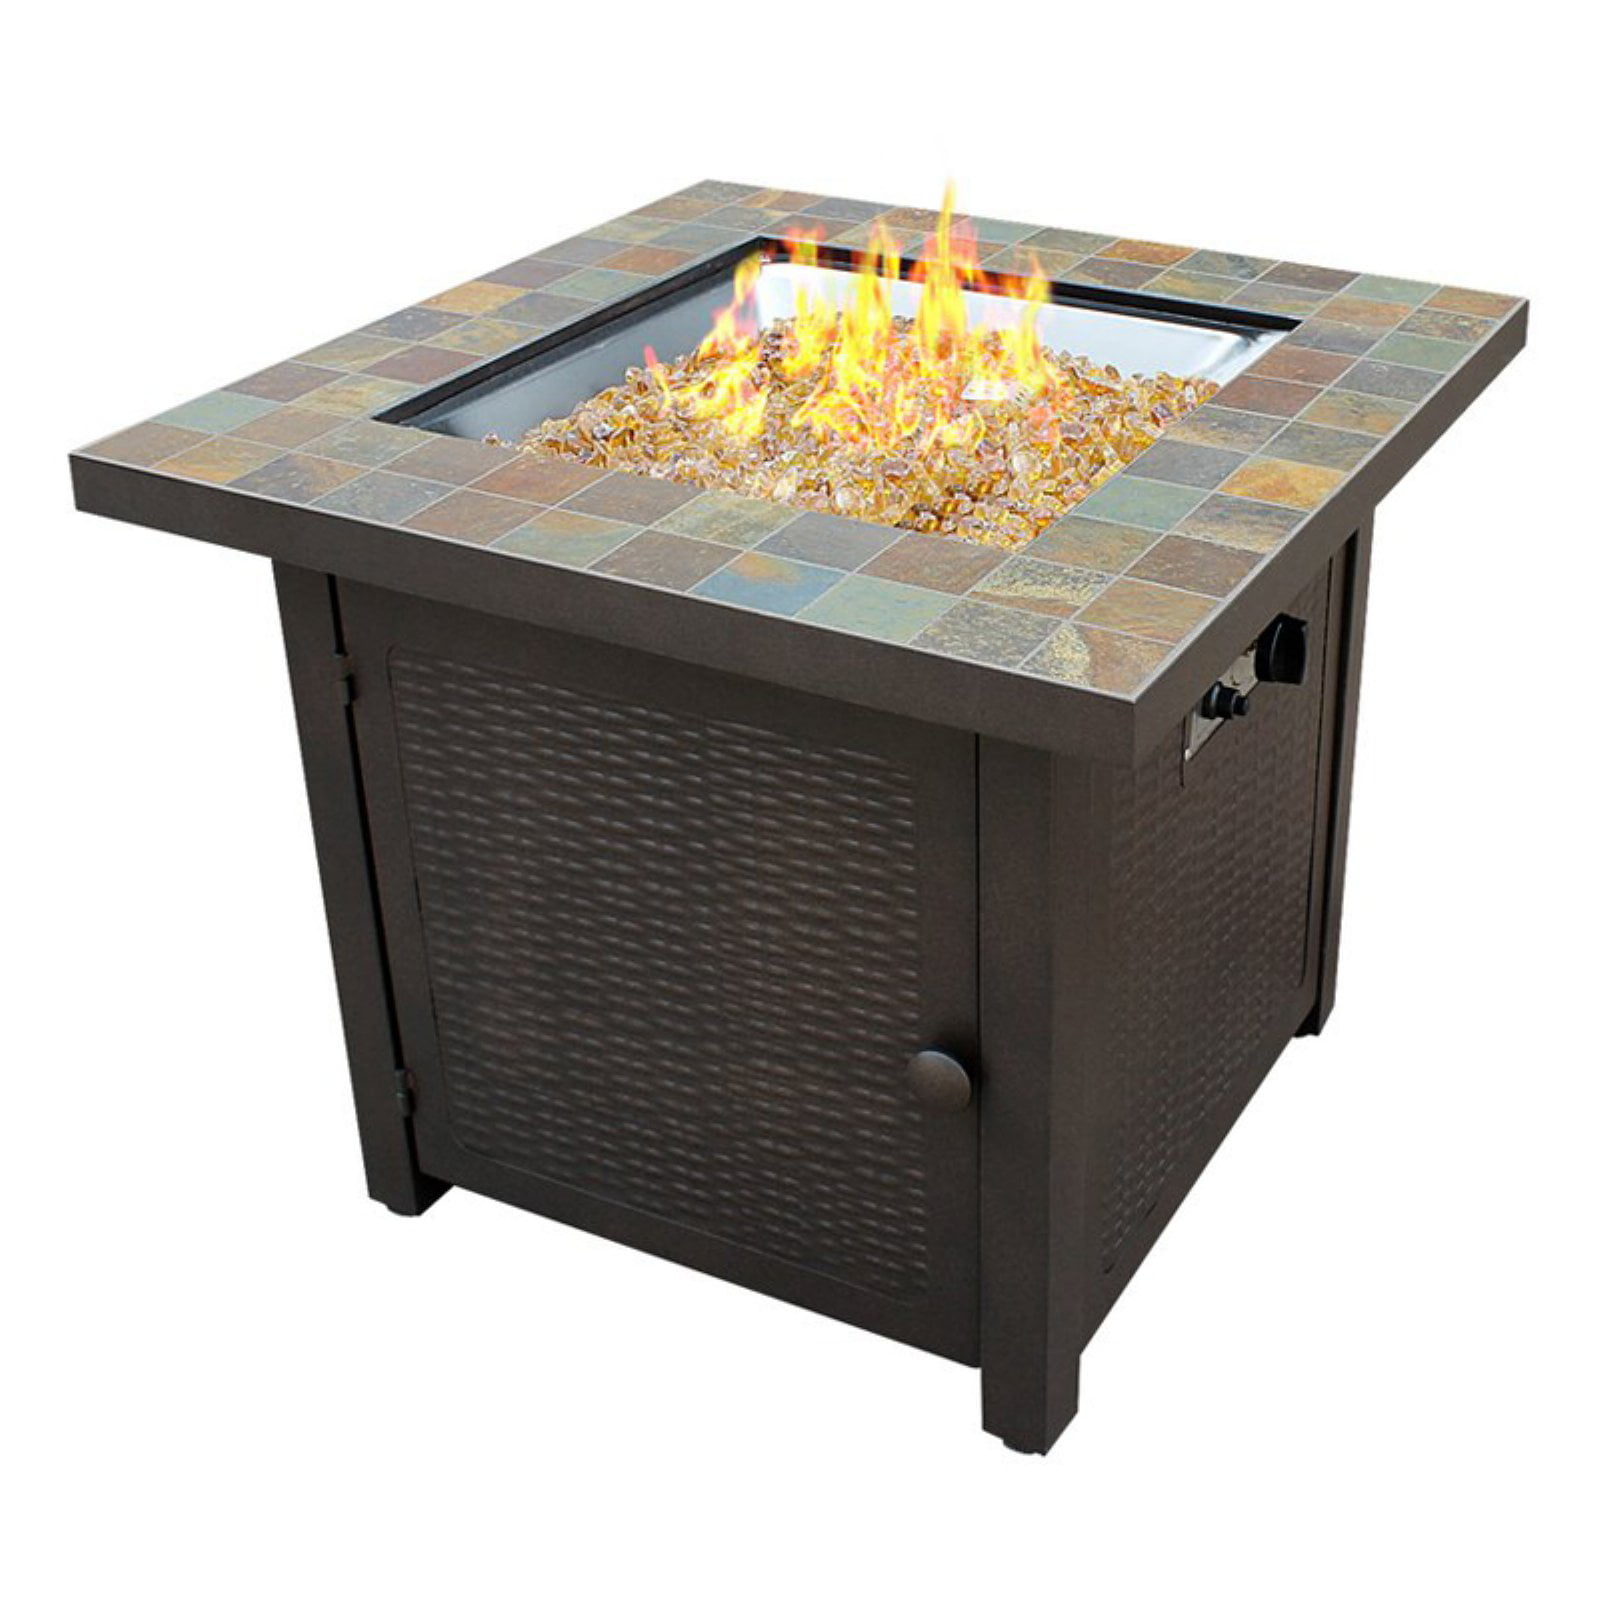 AZ Patio Heaters Square Slate Firepit by AZ Patio Heaters